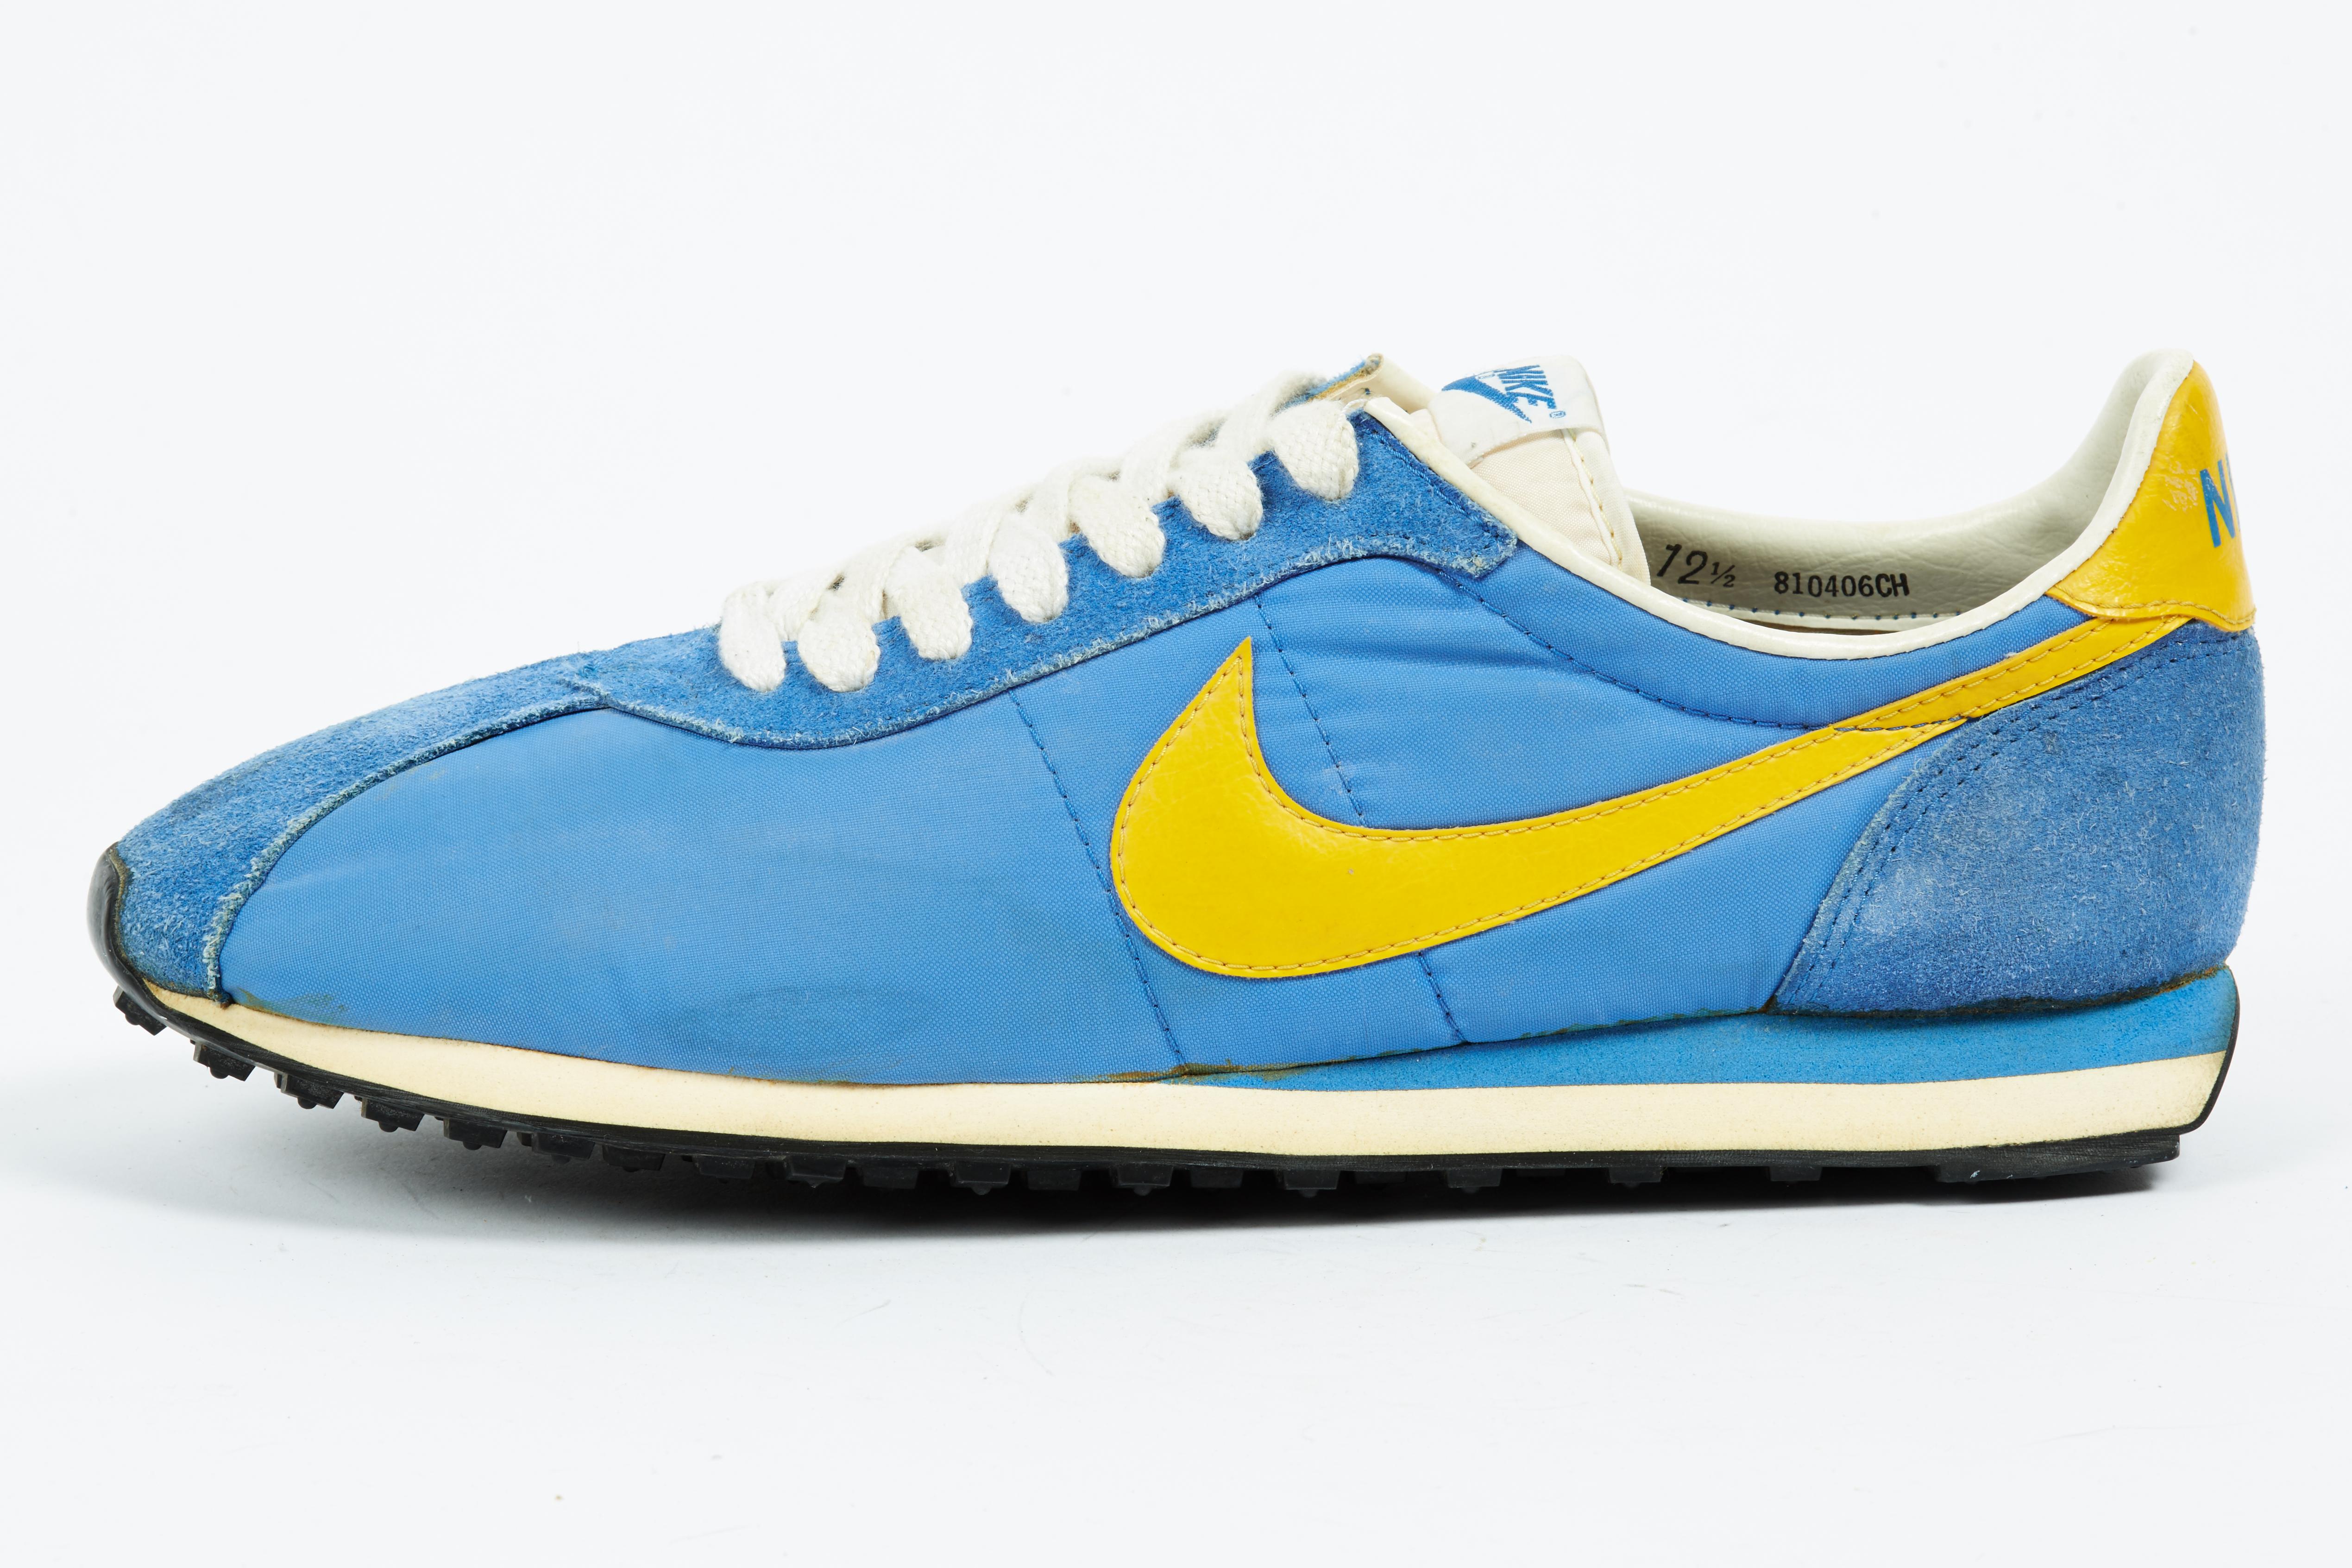 Vintage 1981 Nike Waffle Trainer